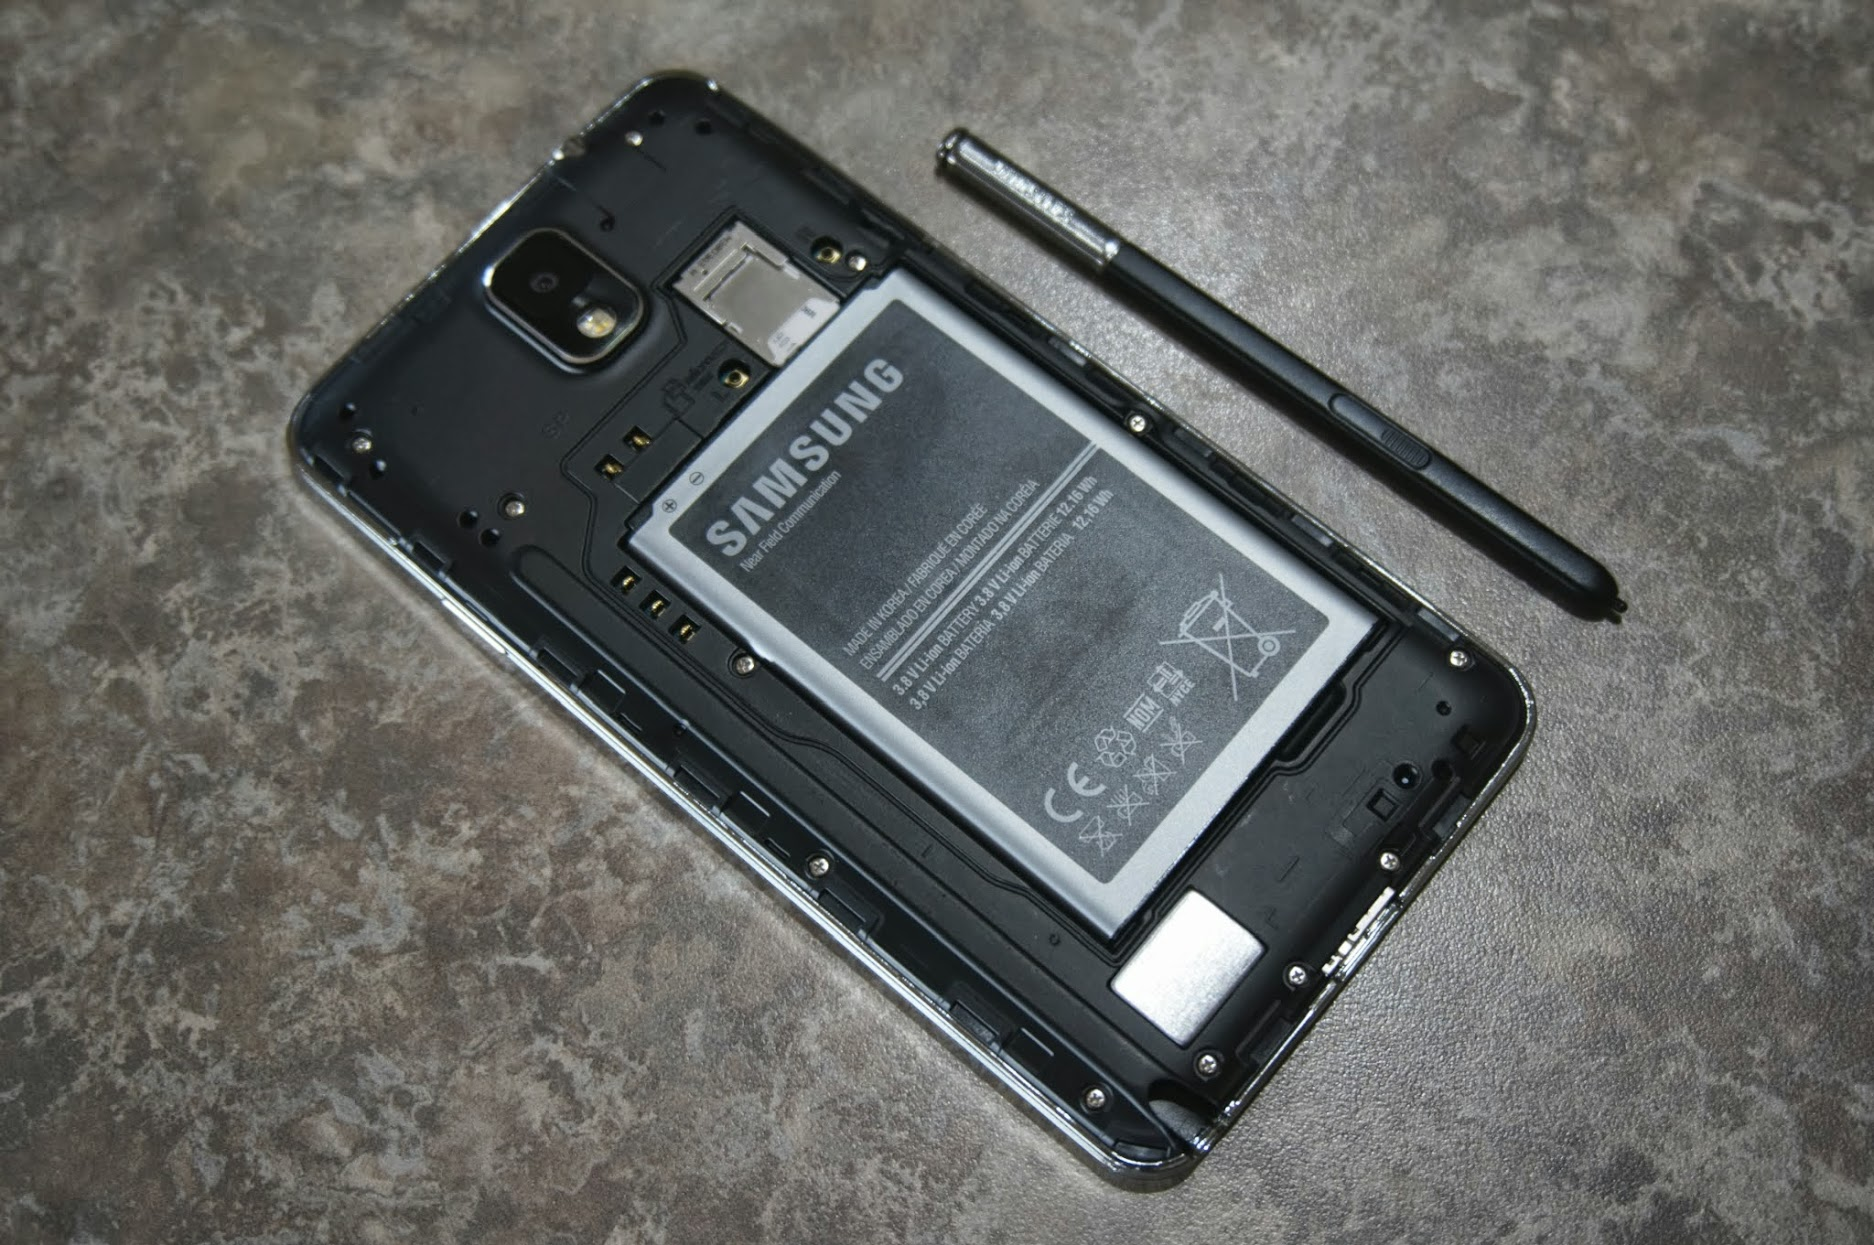 Galaxy Note 3 back